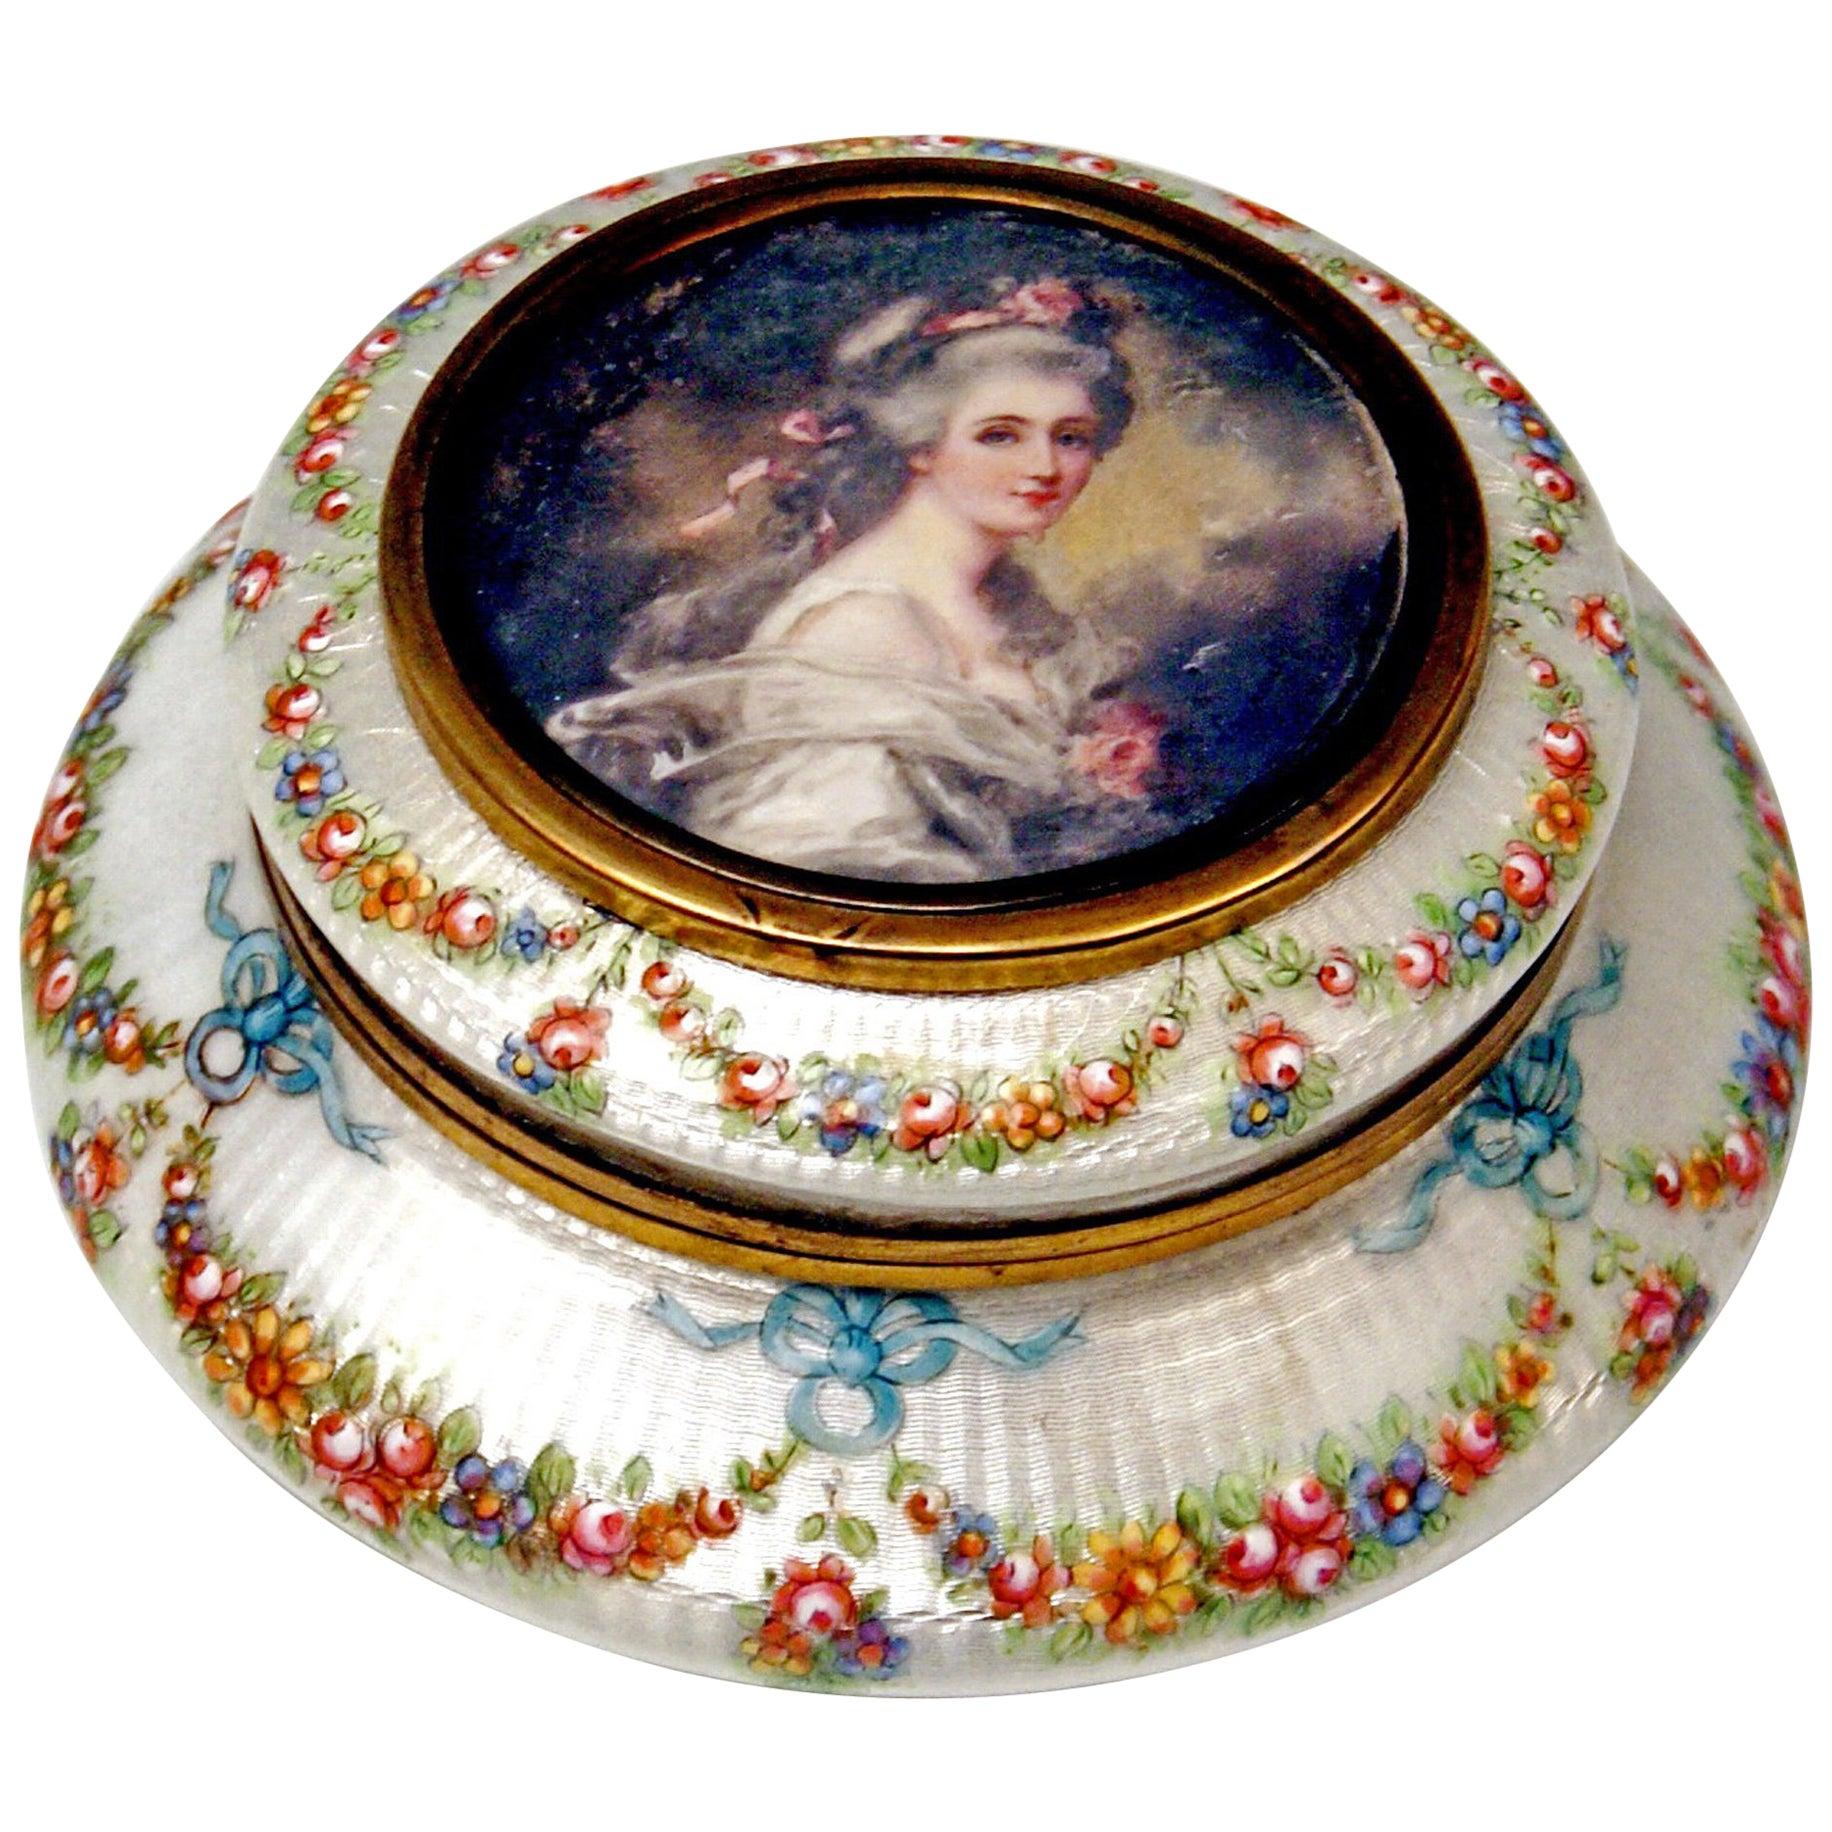 Enamel Box Gilt Inside Painted Flowers Garlands Lady's Portrait, France